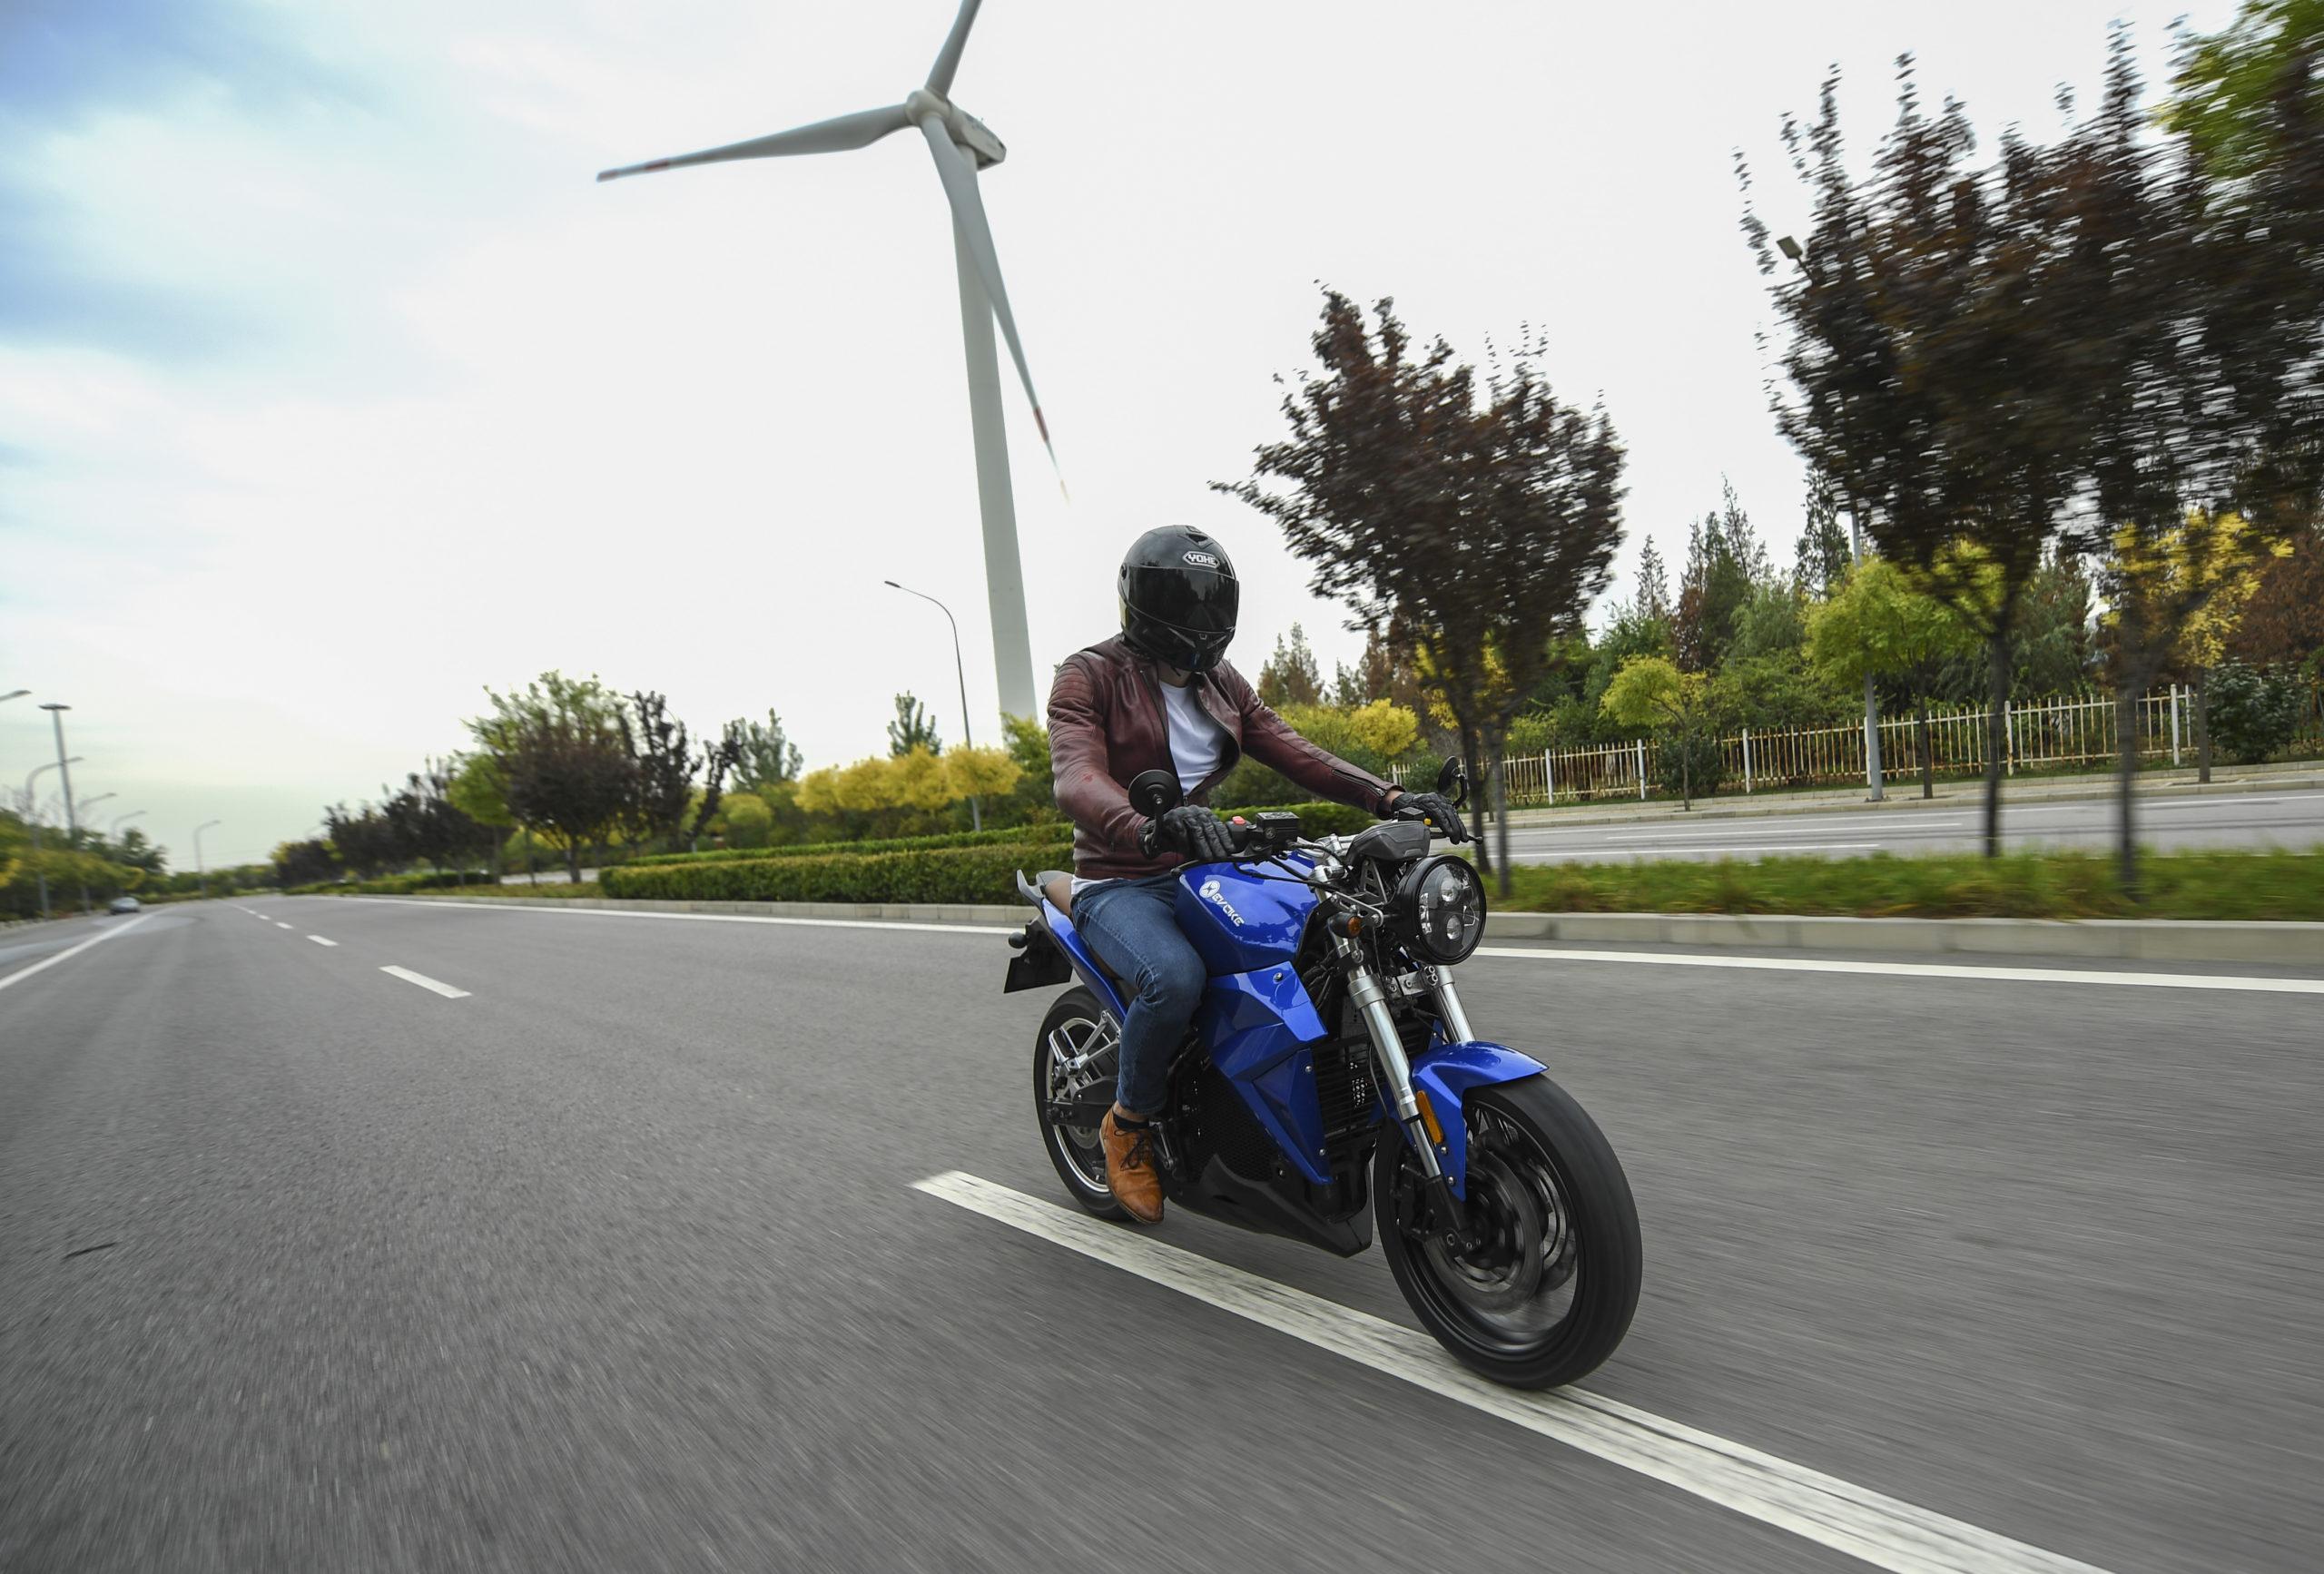 Riders Vision - Evoke Electric